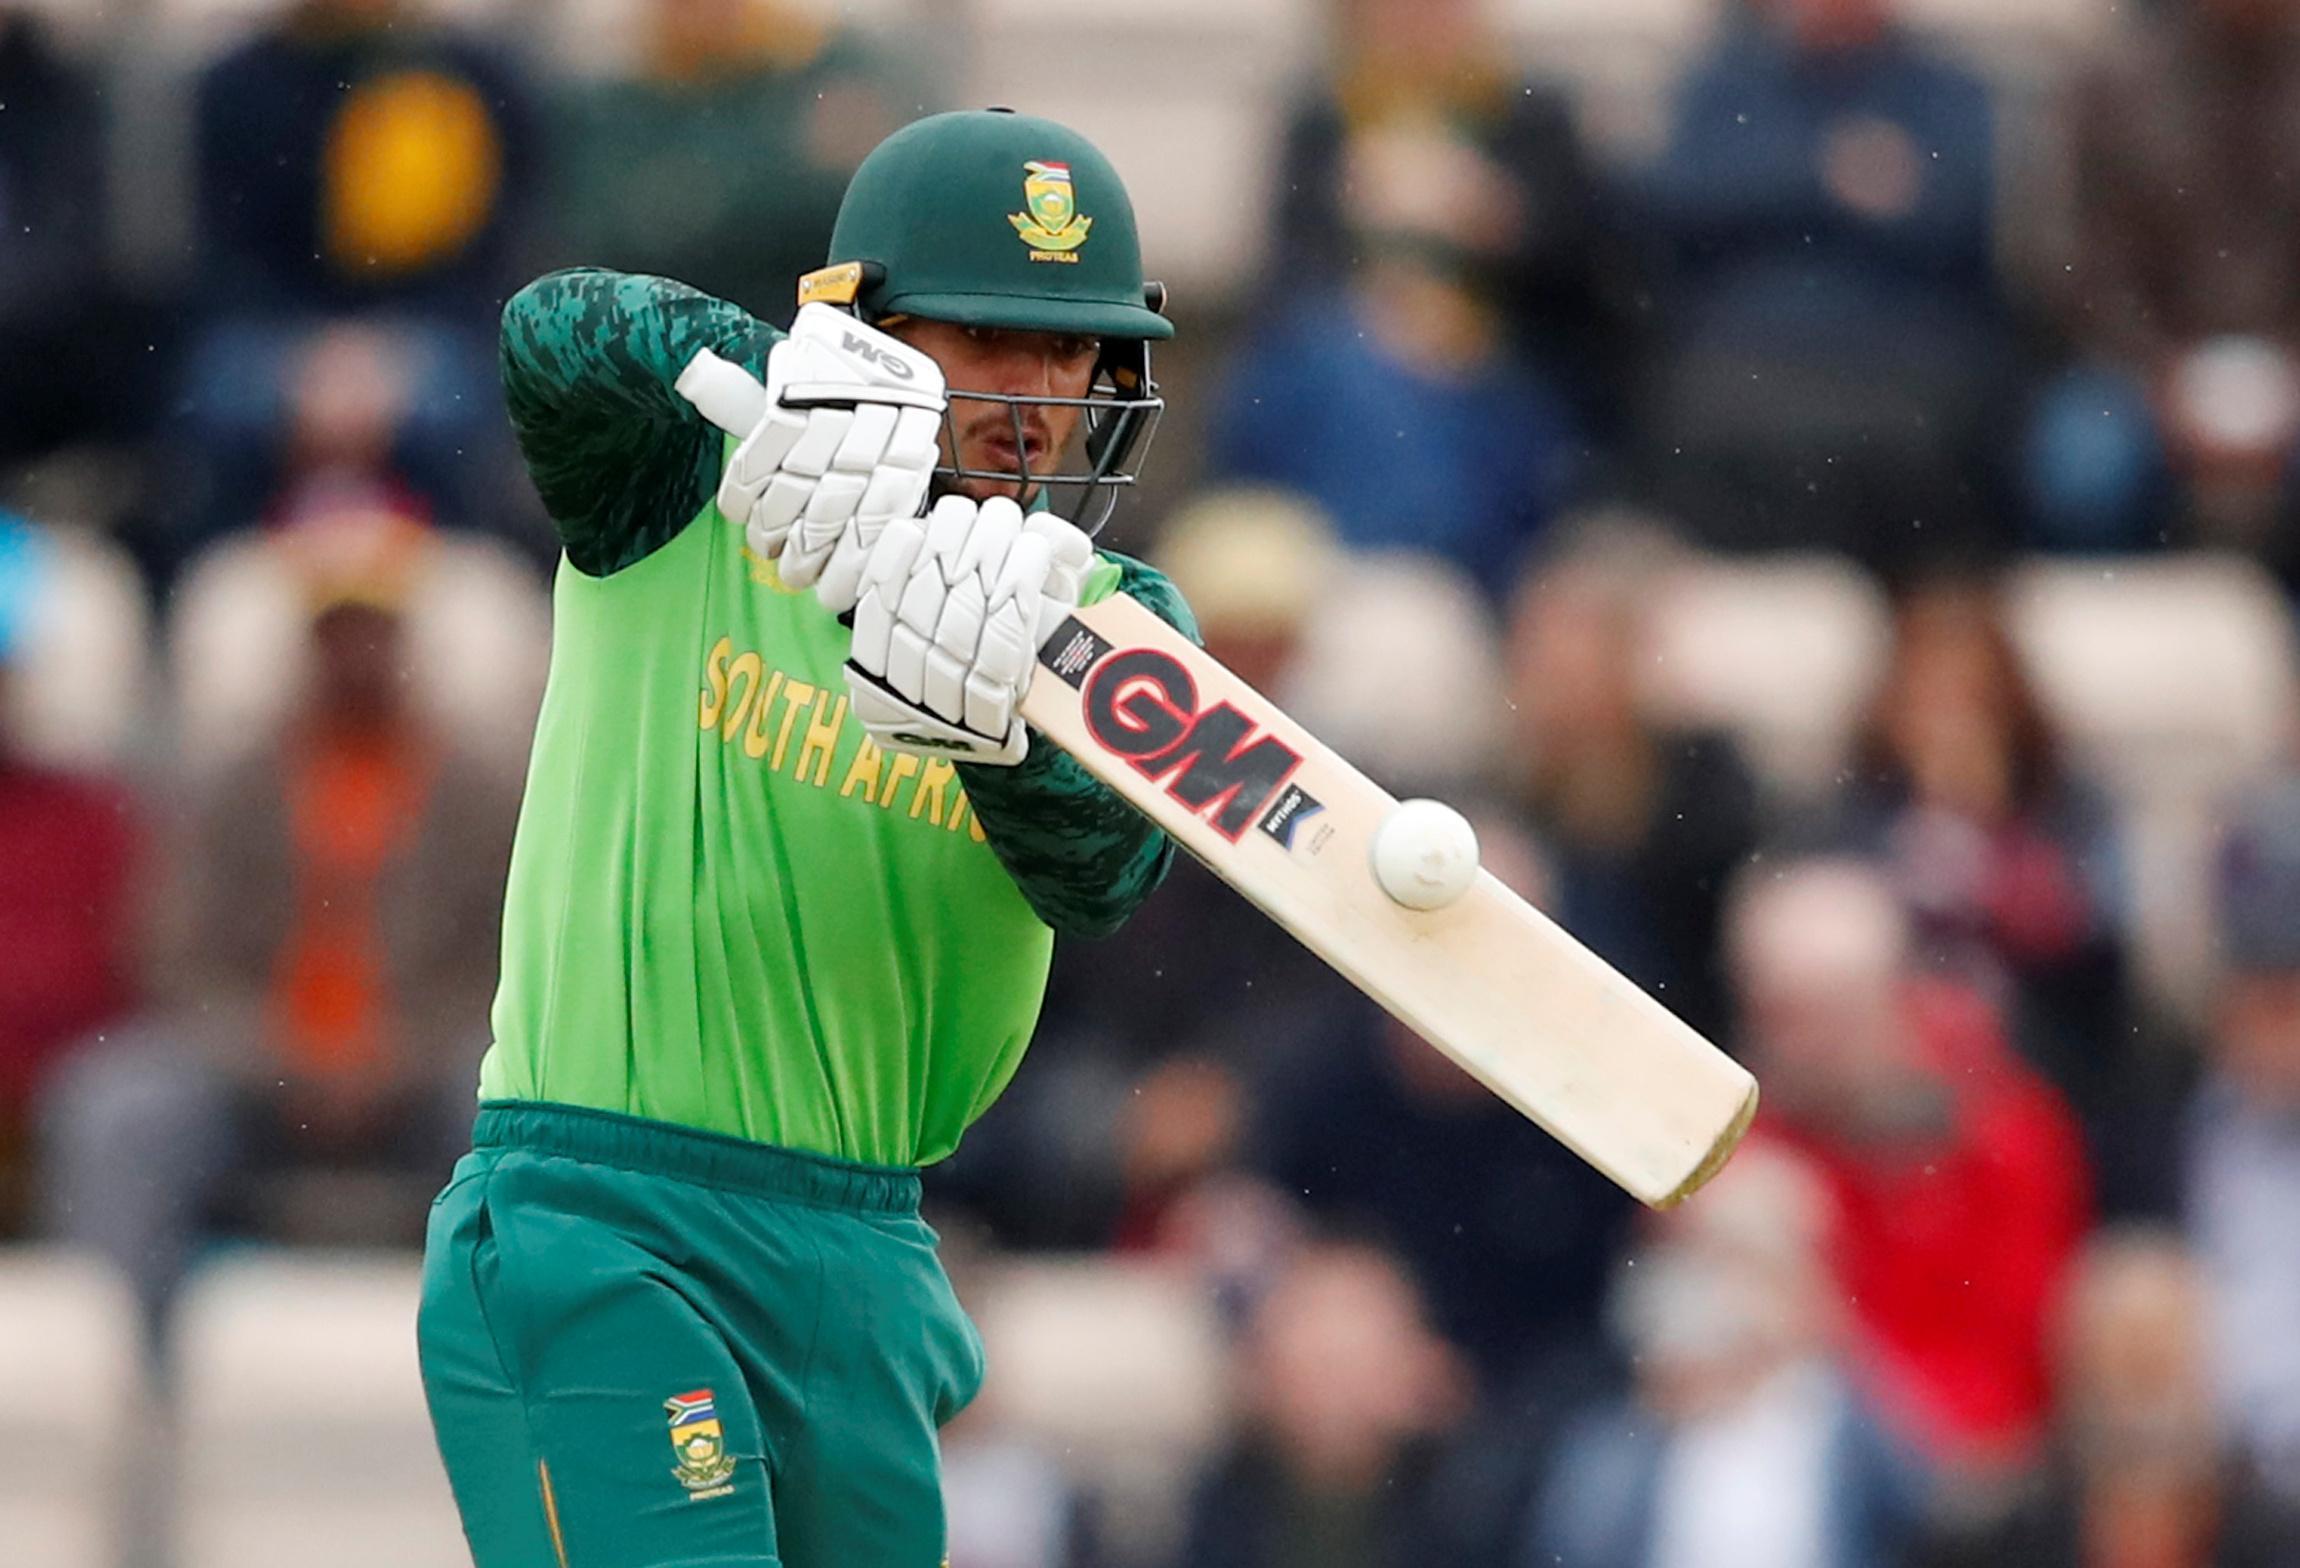 South Africa confident ahead of New Zealand 'quarter-final' - De Kock